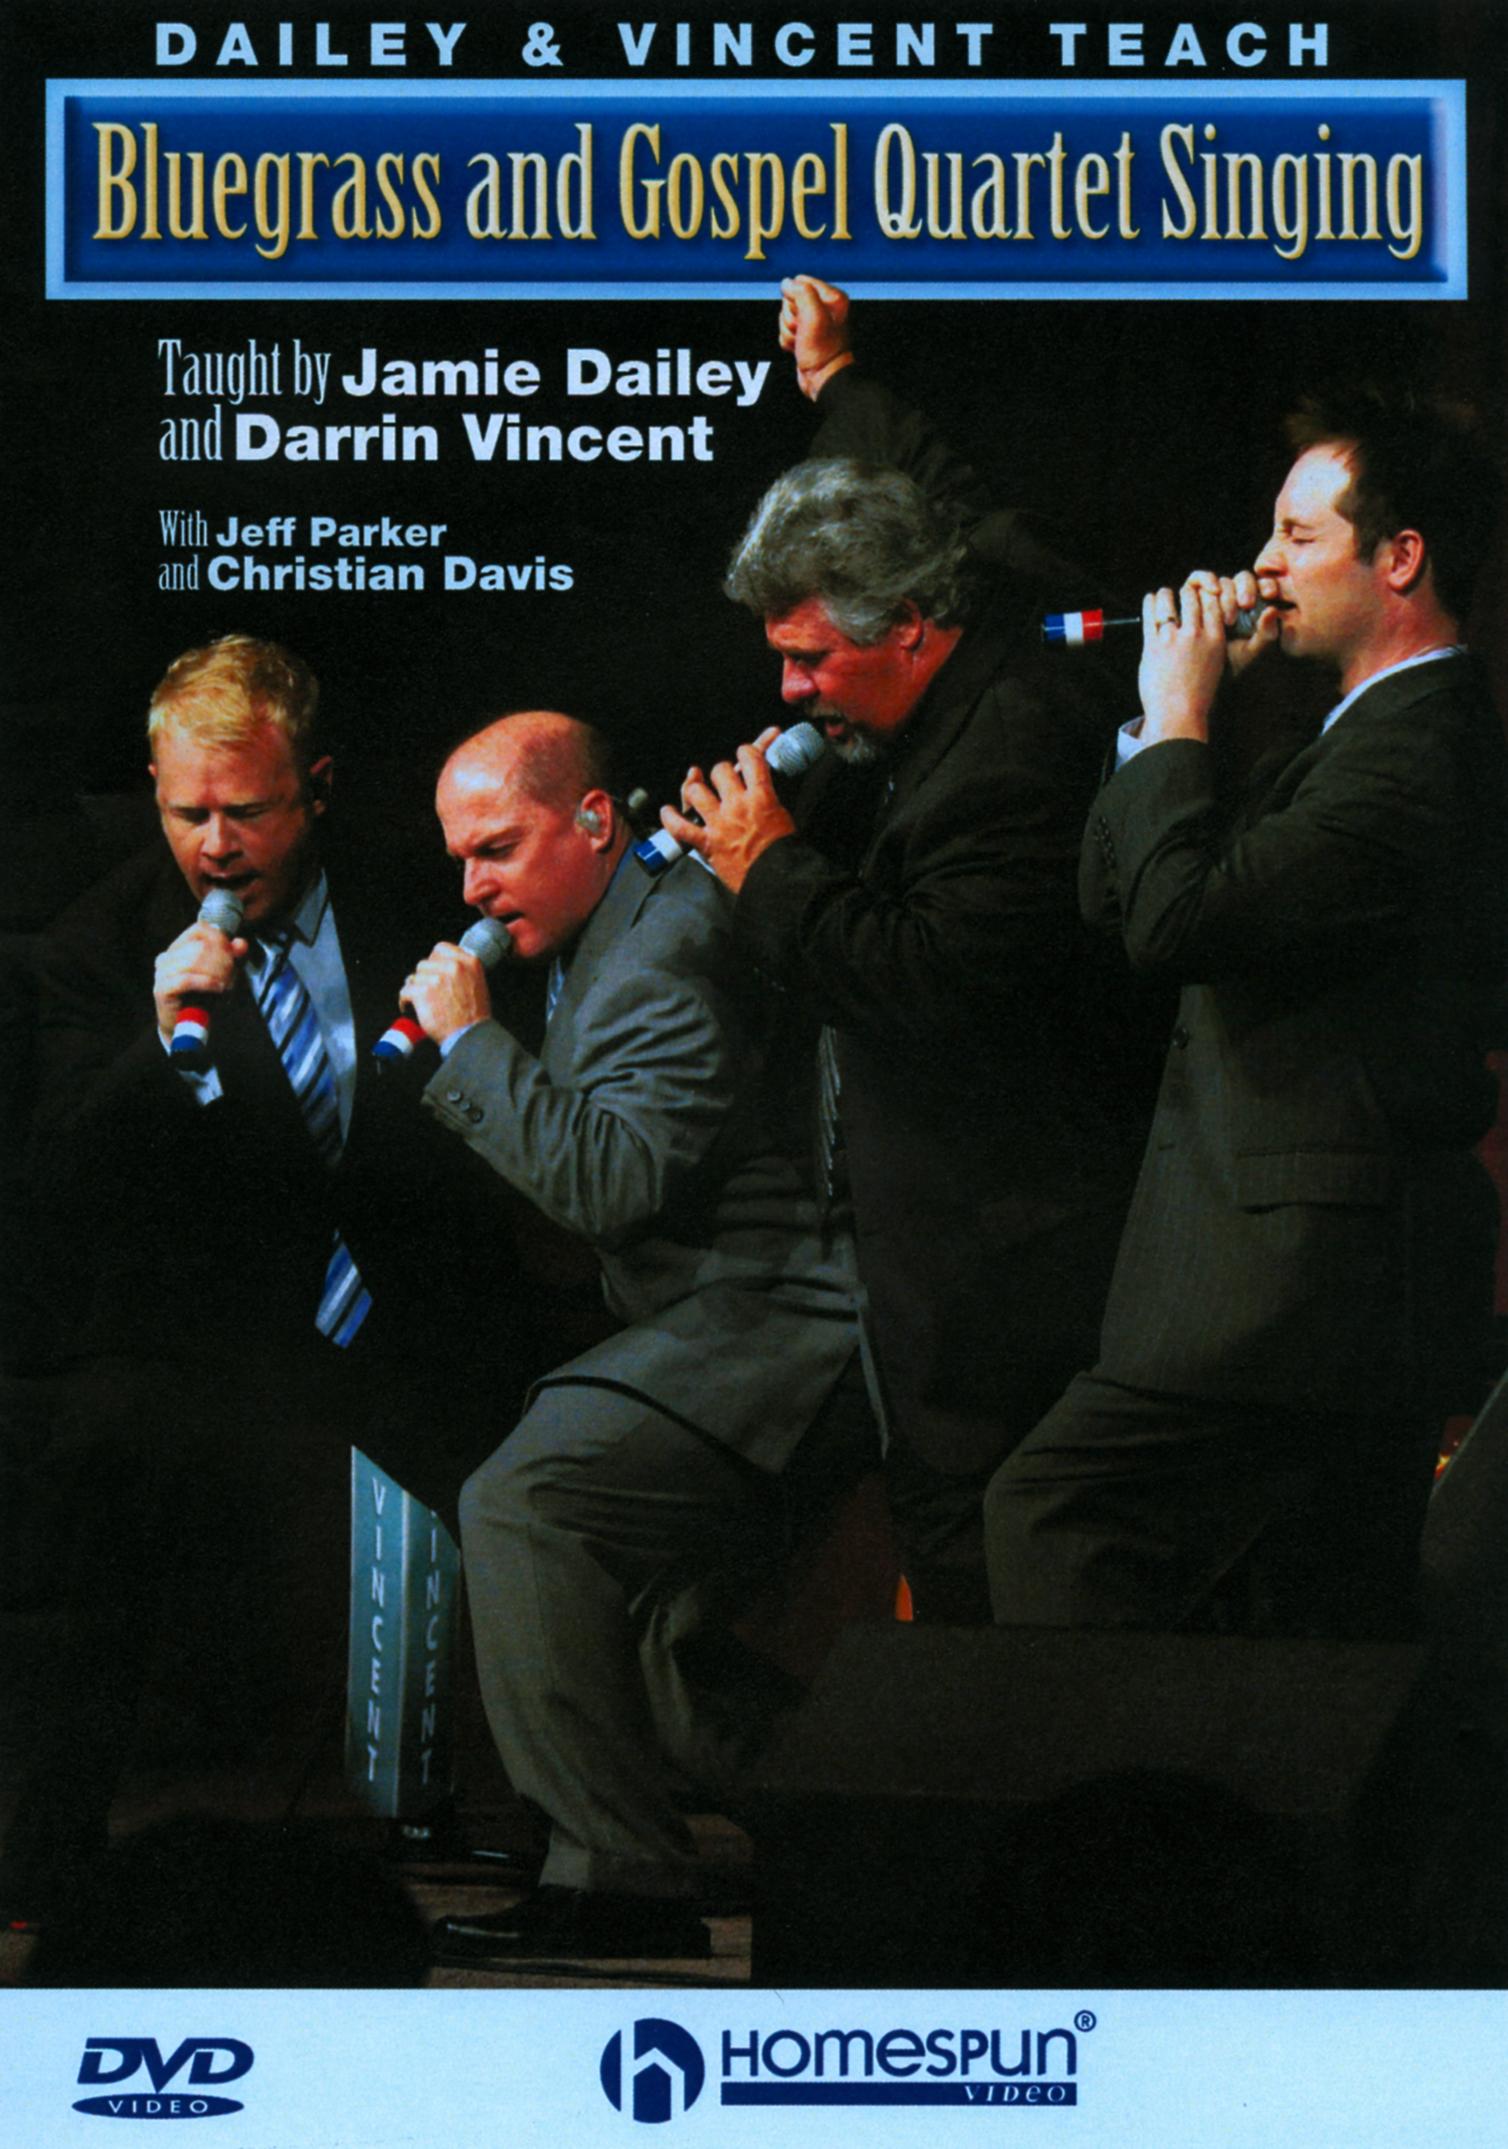 Dailey & Vincent Teach Bluegrass and Gospel Quartet Singing